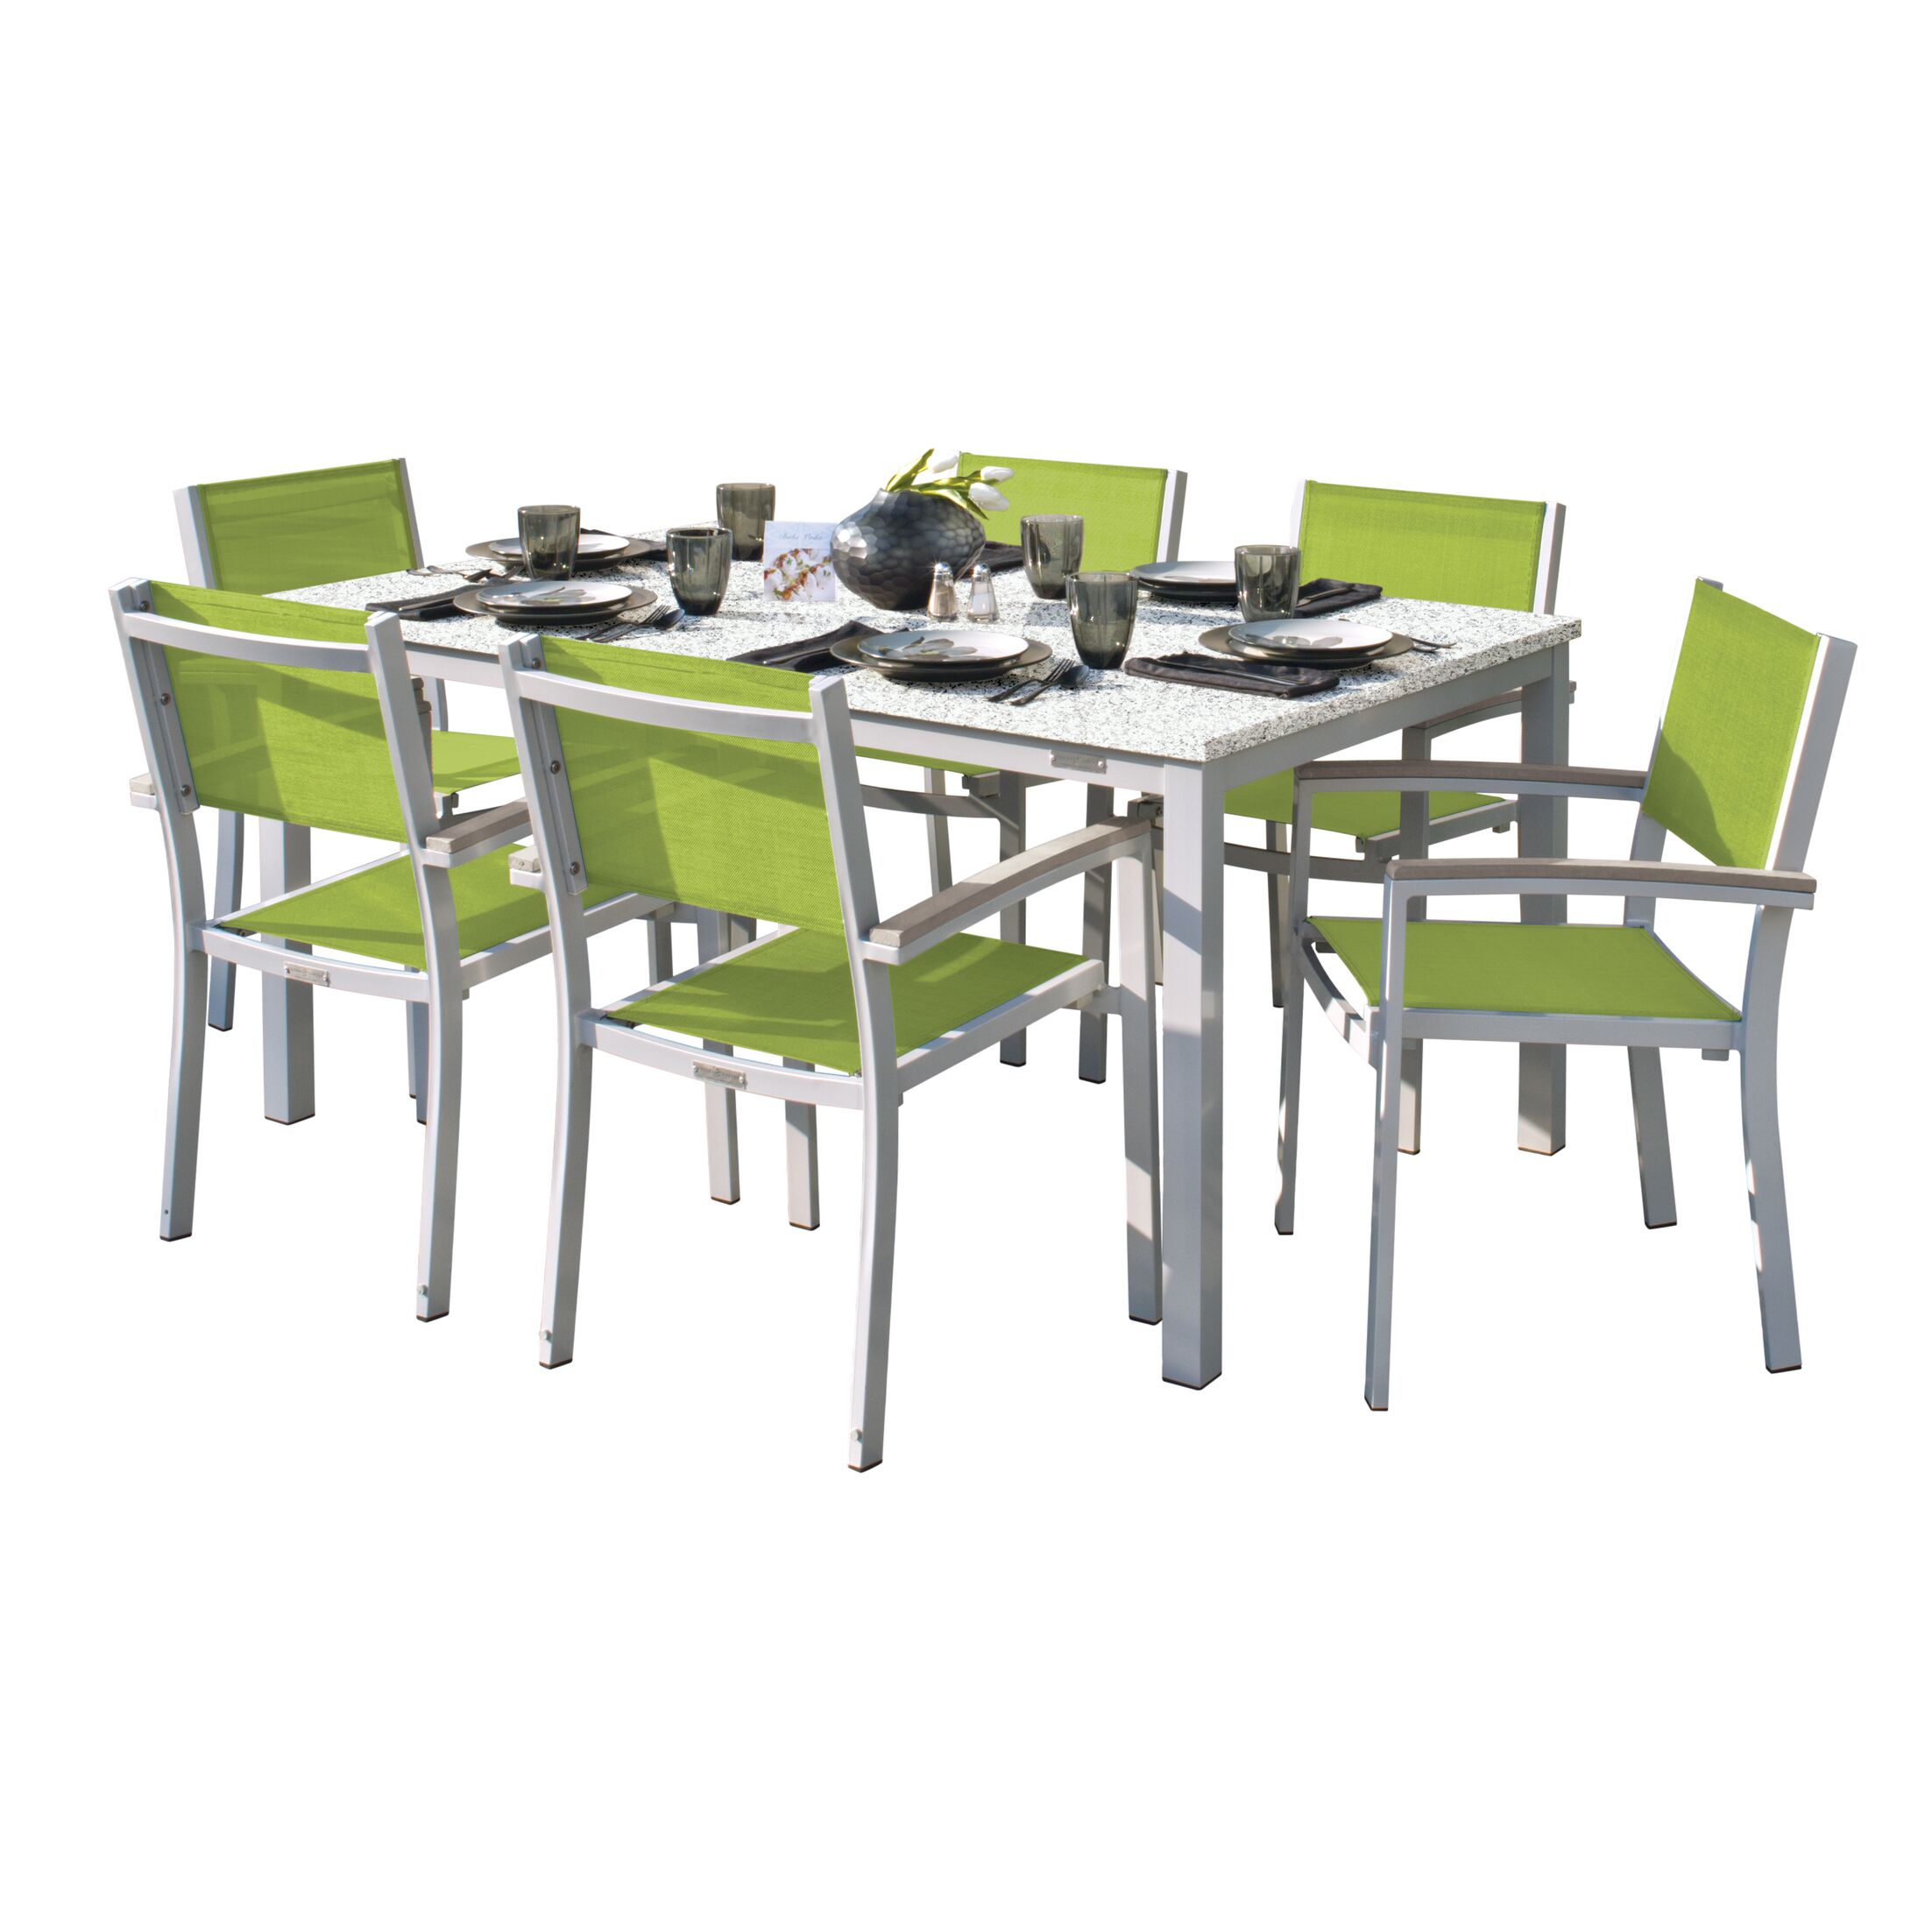 Laskowski 7 Piece Teak Dining Set Cushion Color: Go Green